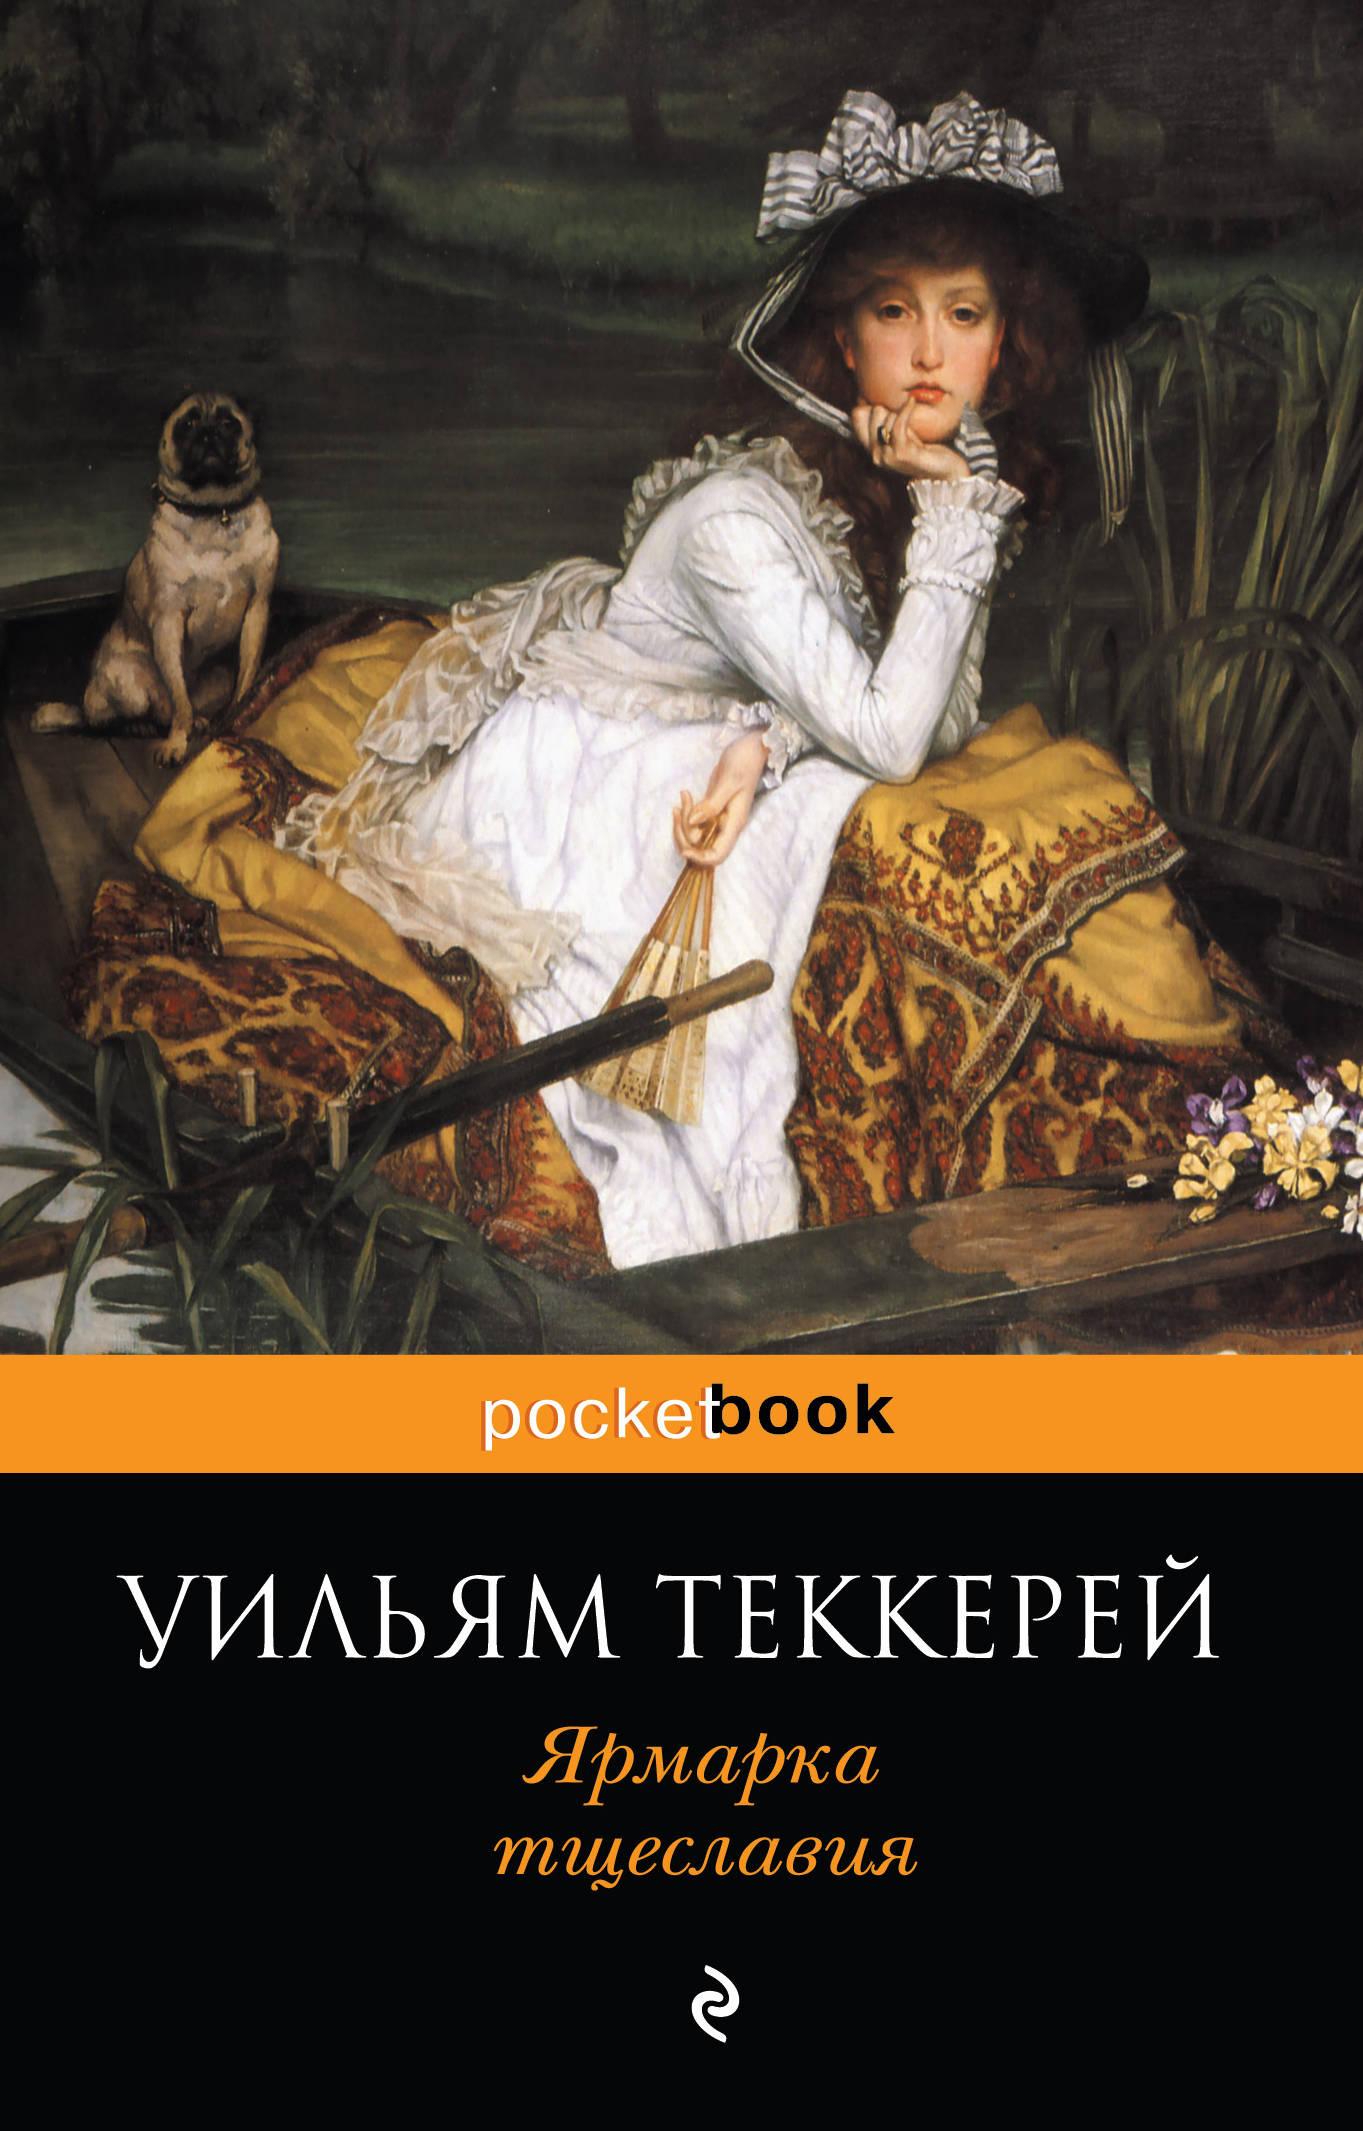 Теккерей Уильям Мейкпис Ярмарка тщеславия уильям мейкпис теккерей ярмарка тщеславия